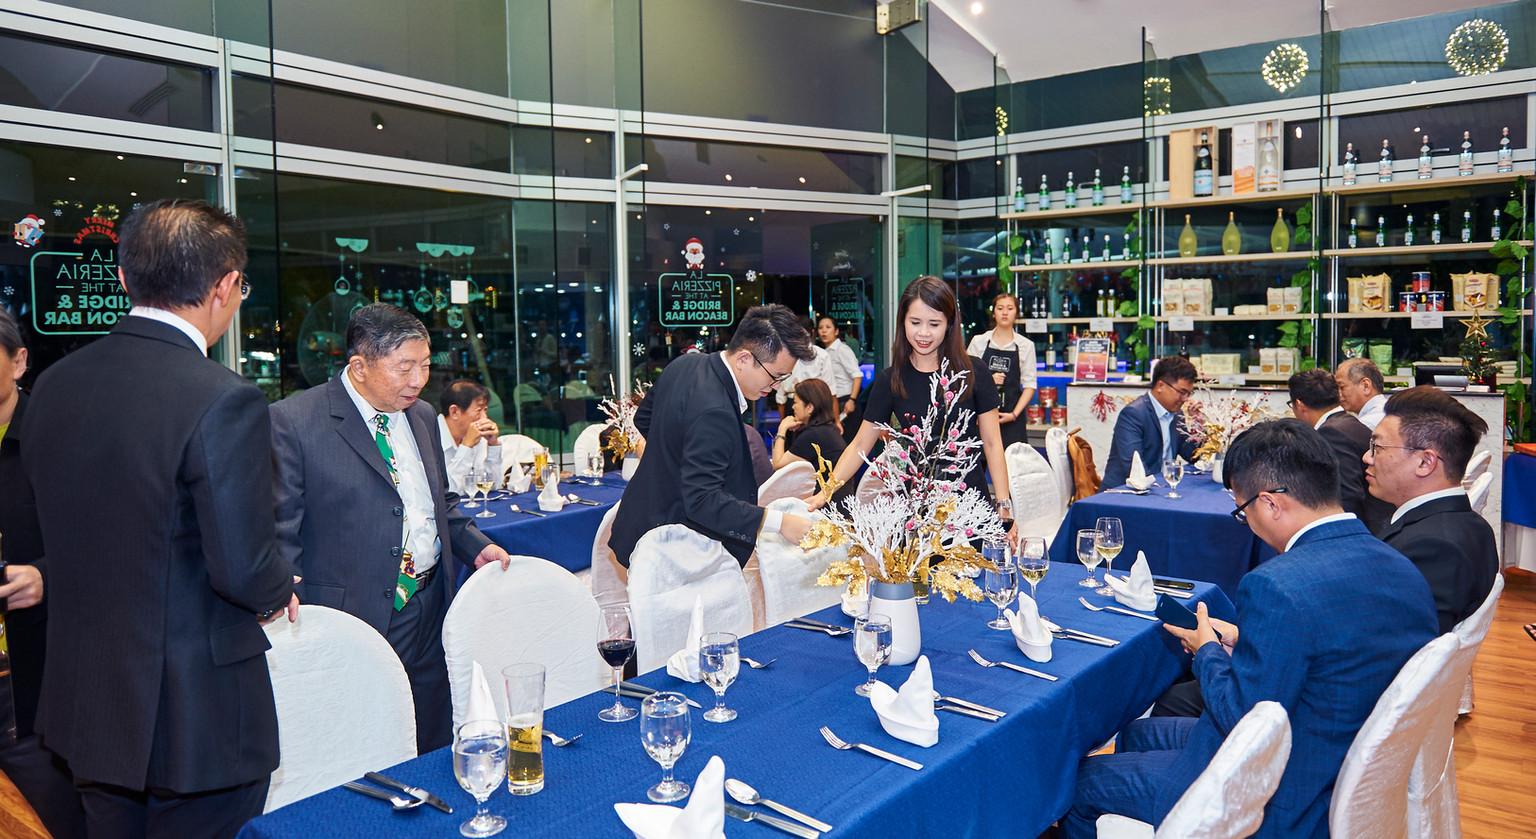 GE_Xmas_dinner211218_0184.jpg